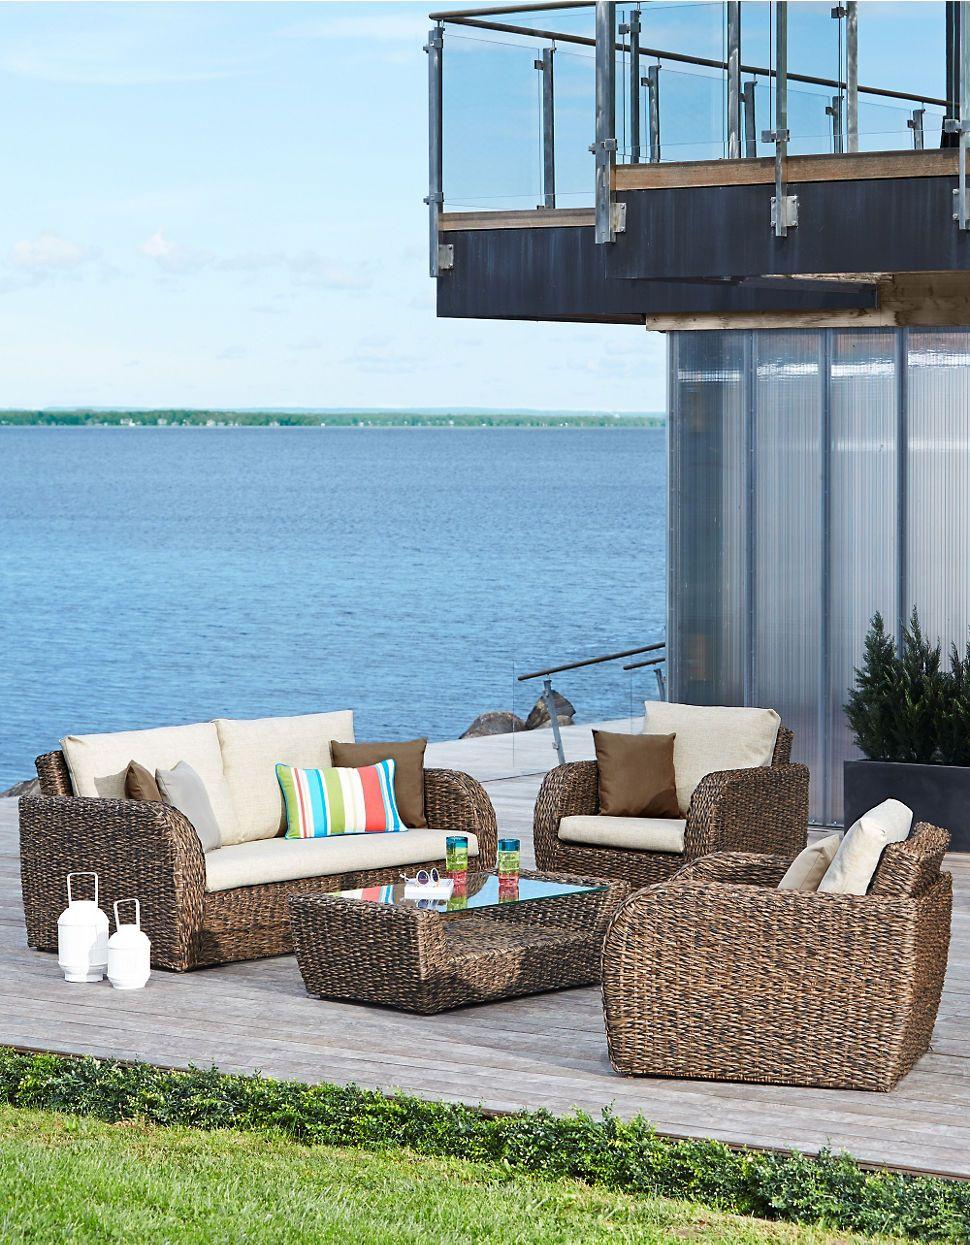 Home Lounge Sets Kopipi 4 Piece Conversation Set Hudson S Bay